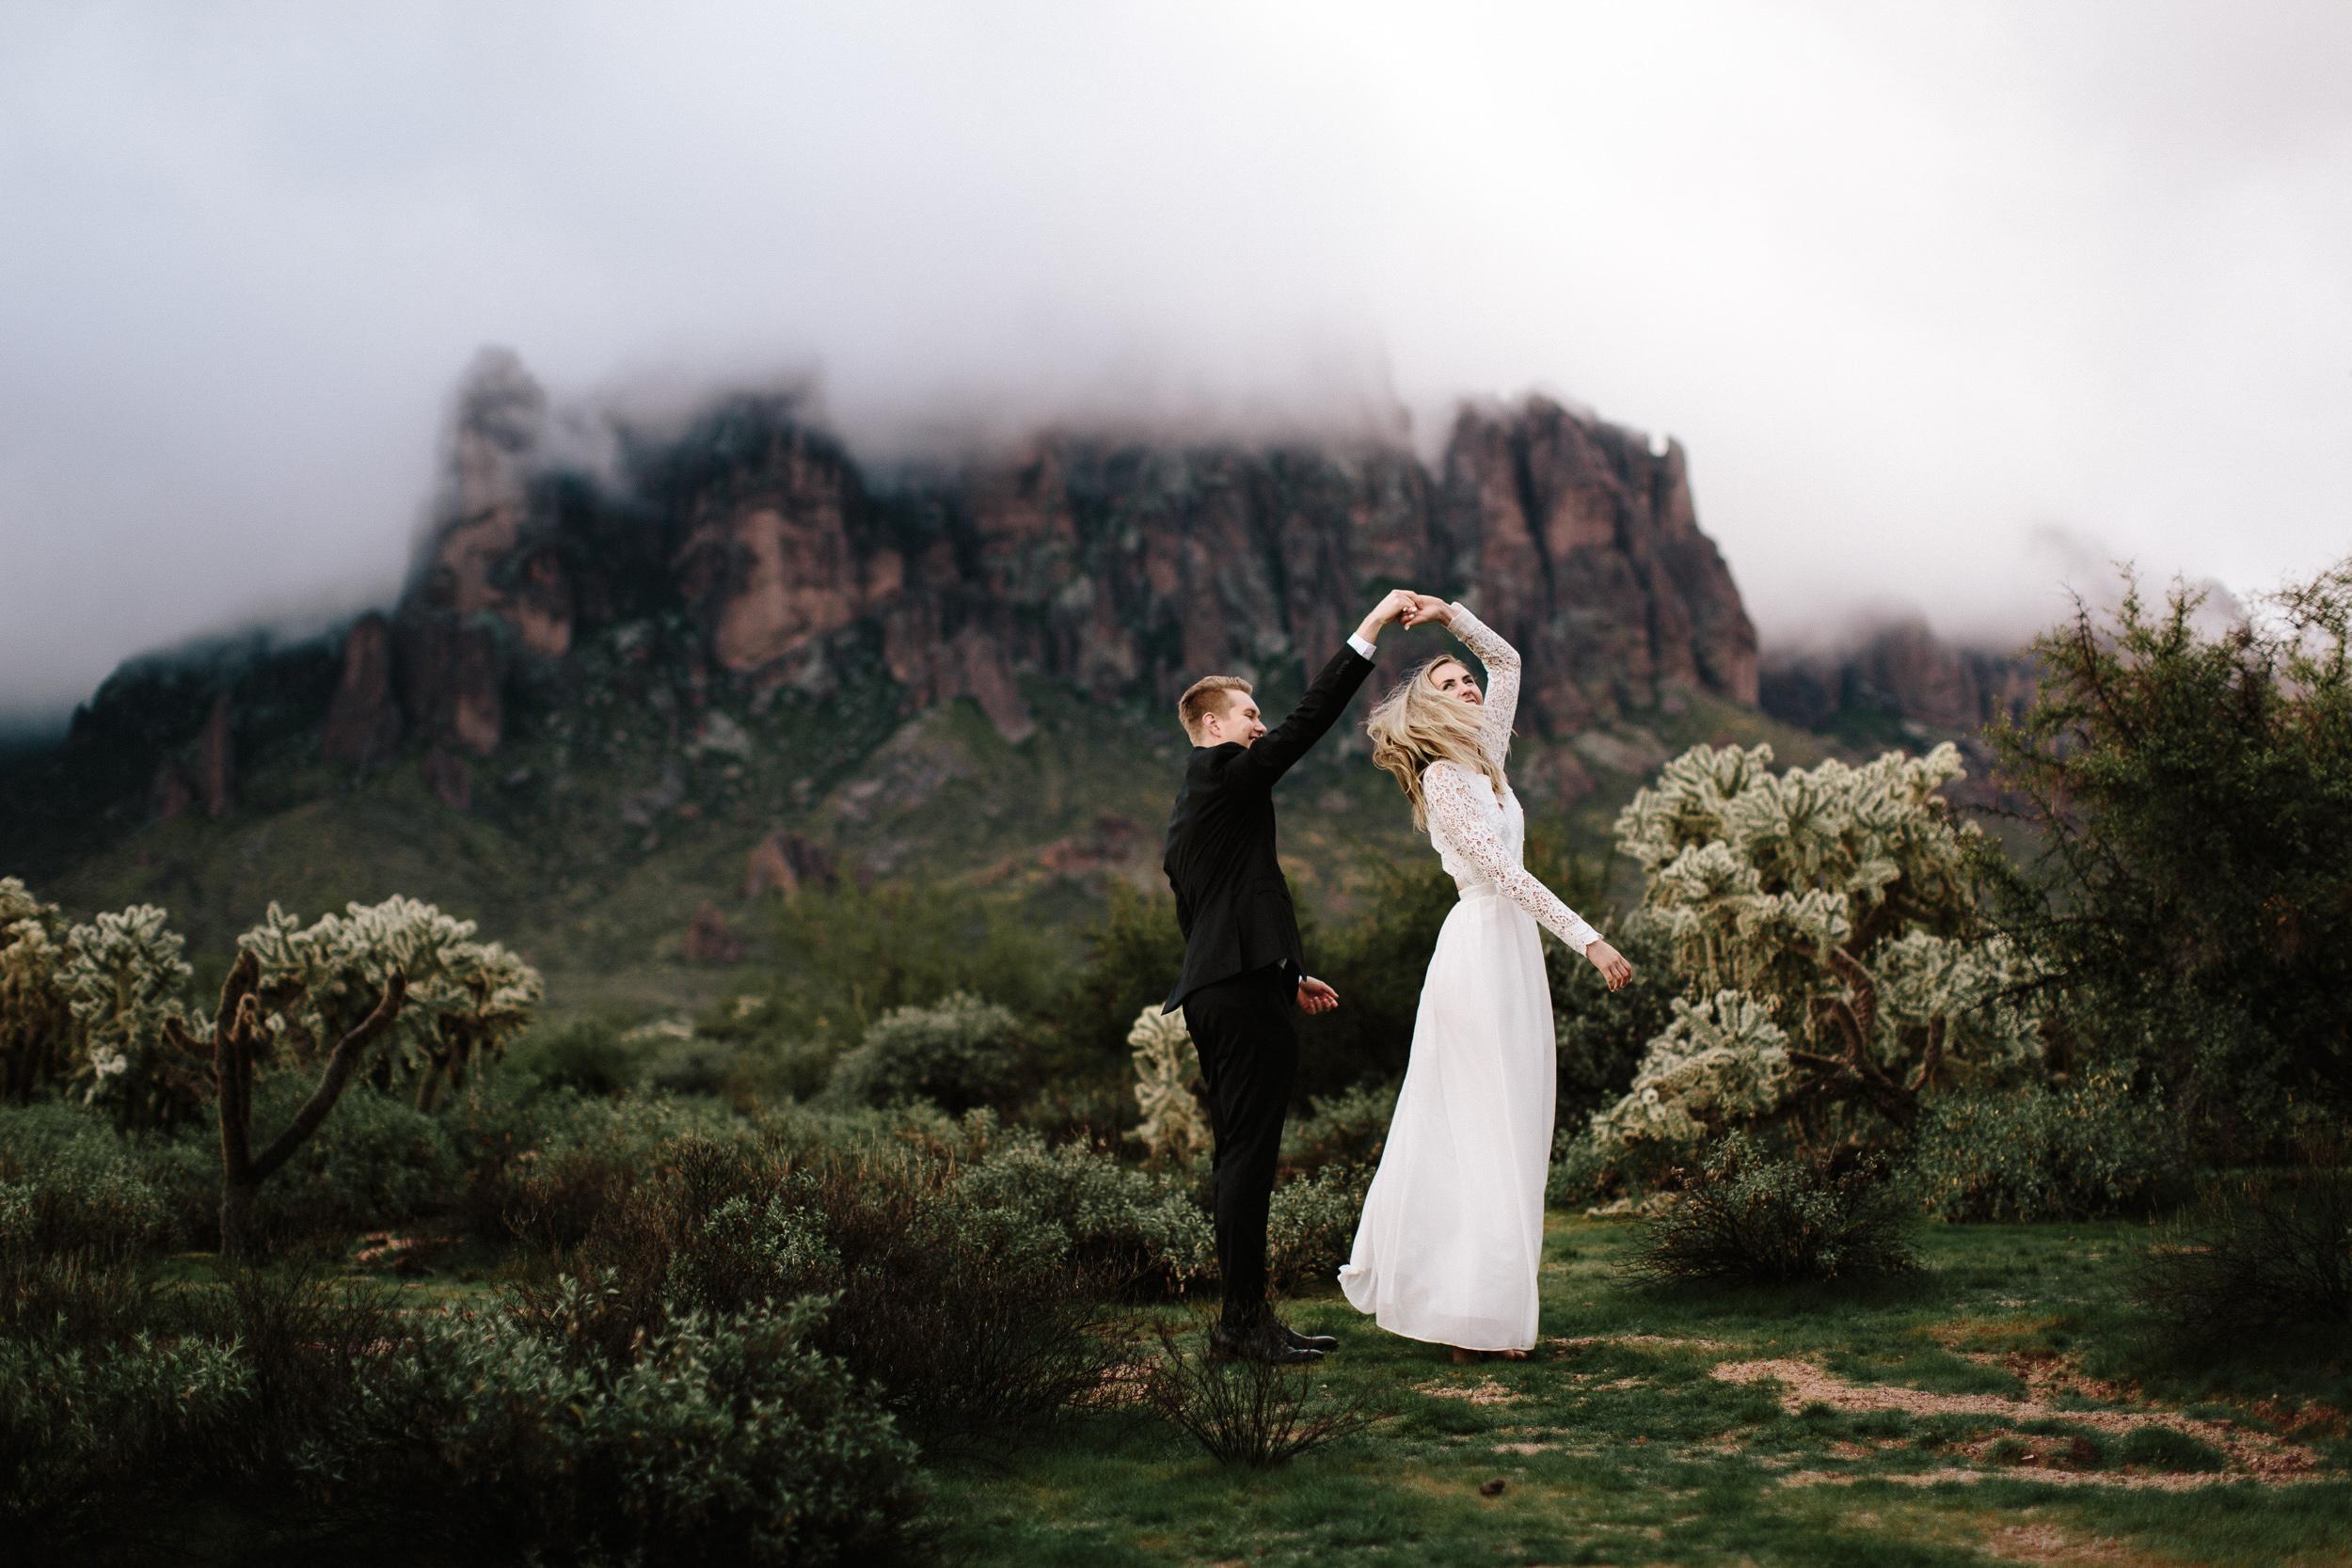 phoenix-mesa-elopement-wedding-photographer-lost-dutchman-state-park-superstitious-mountains-16.jpg